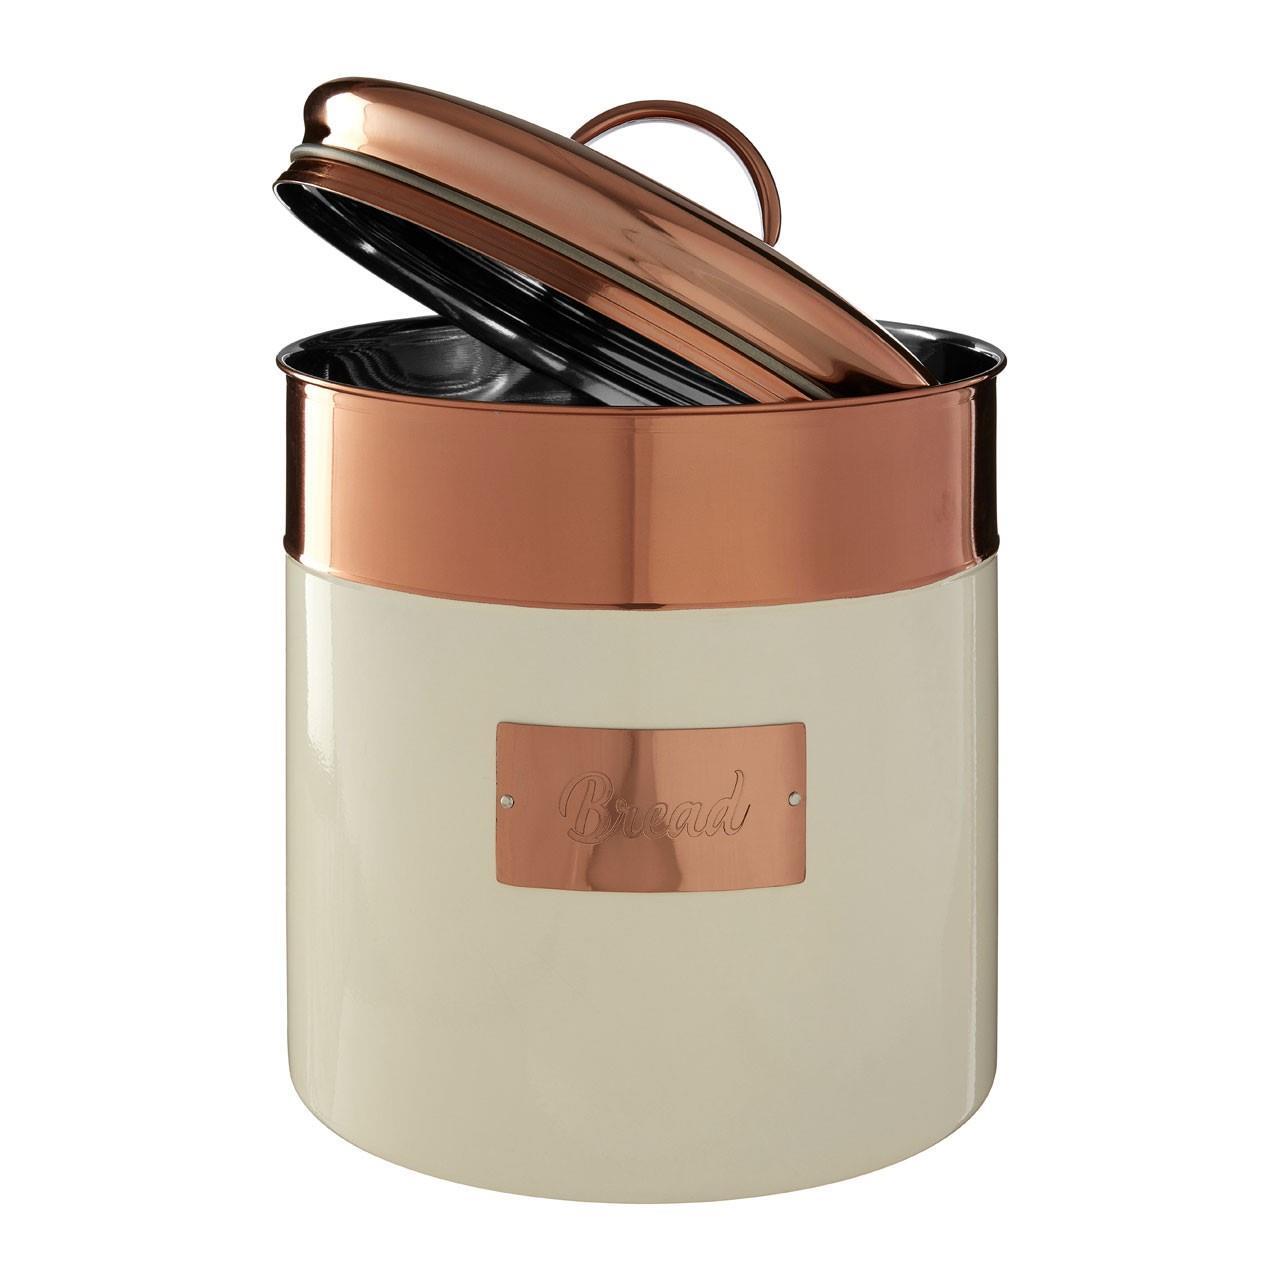 Prescott-Cream-Copper-Bread-Bin-Biscuit-Sugar-Coffee-Canister-Utensil-Holder thumbnail 7